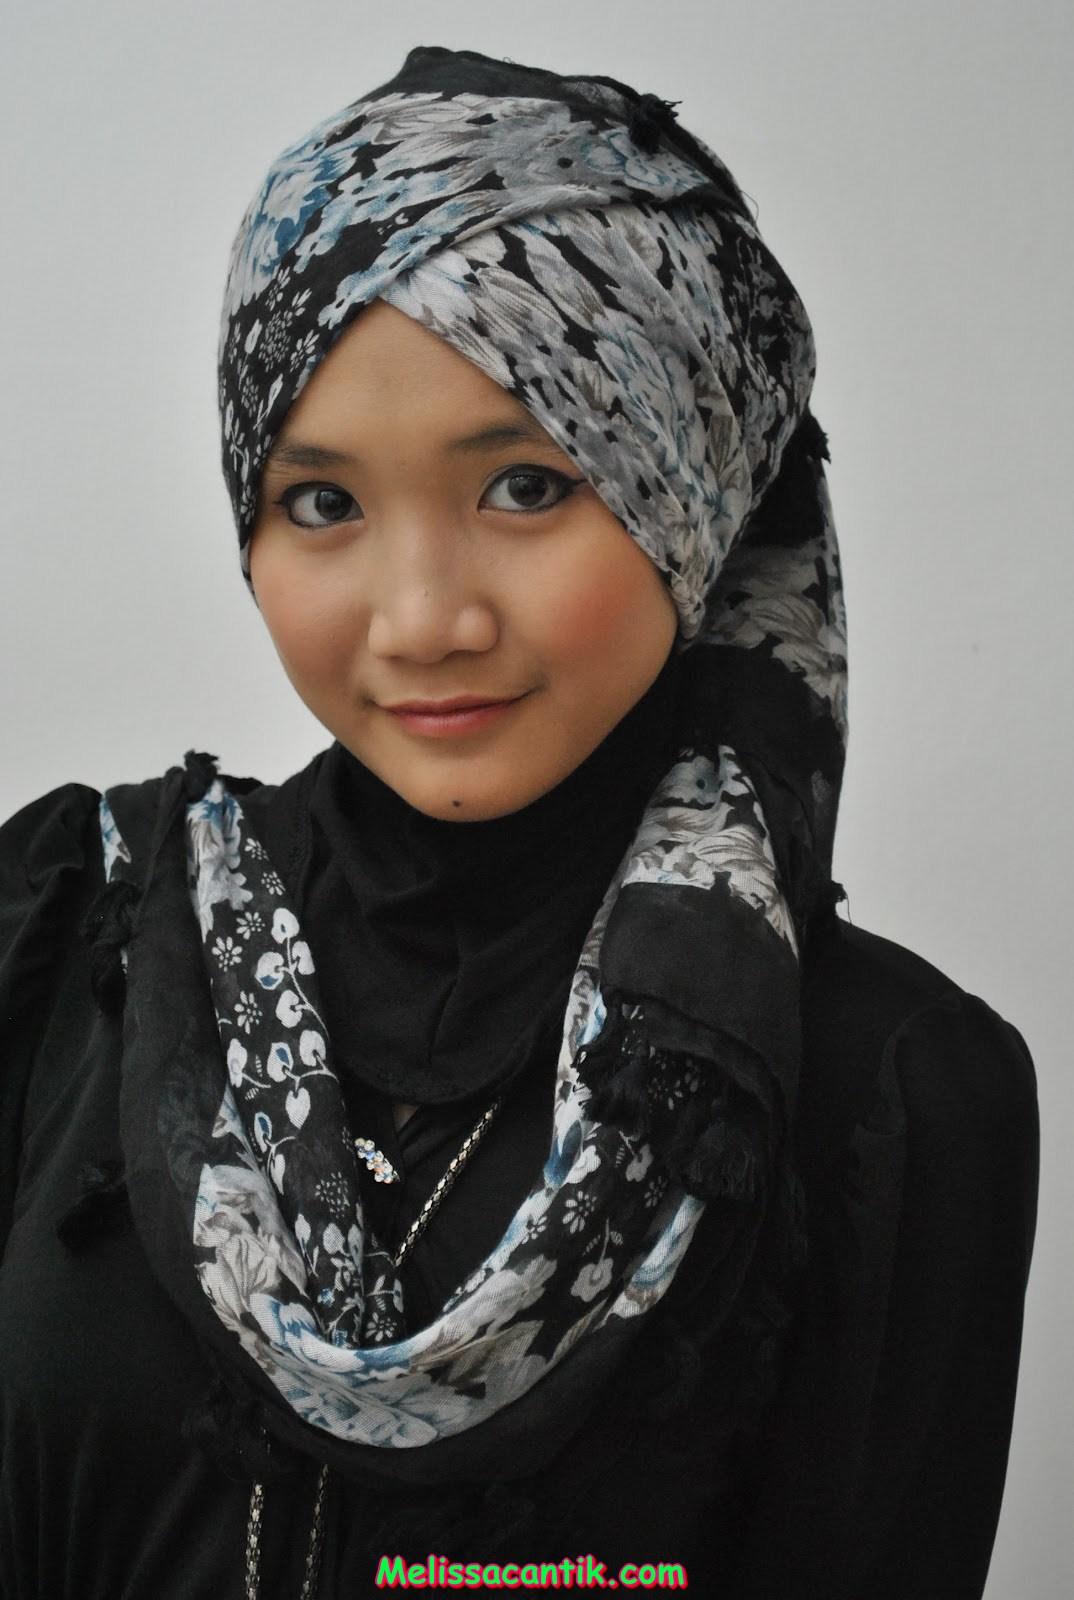 namanya. Lanjutan dari Foto Model Jilbab Cantik Part 1 Doi punya